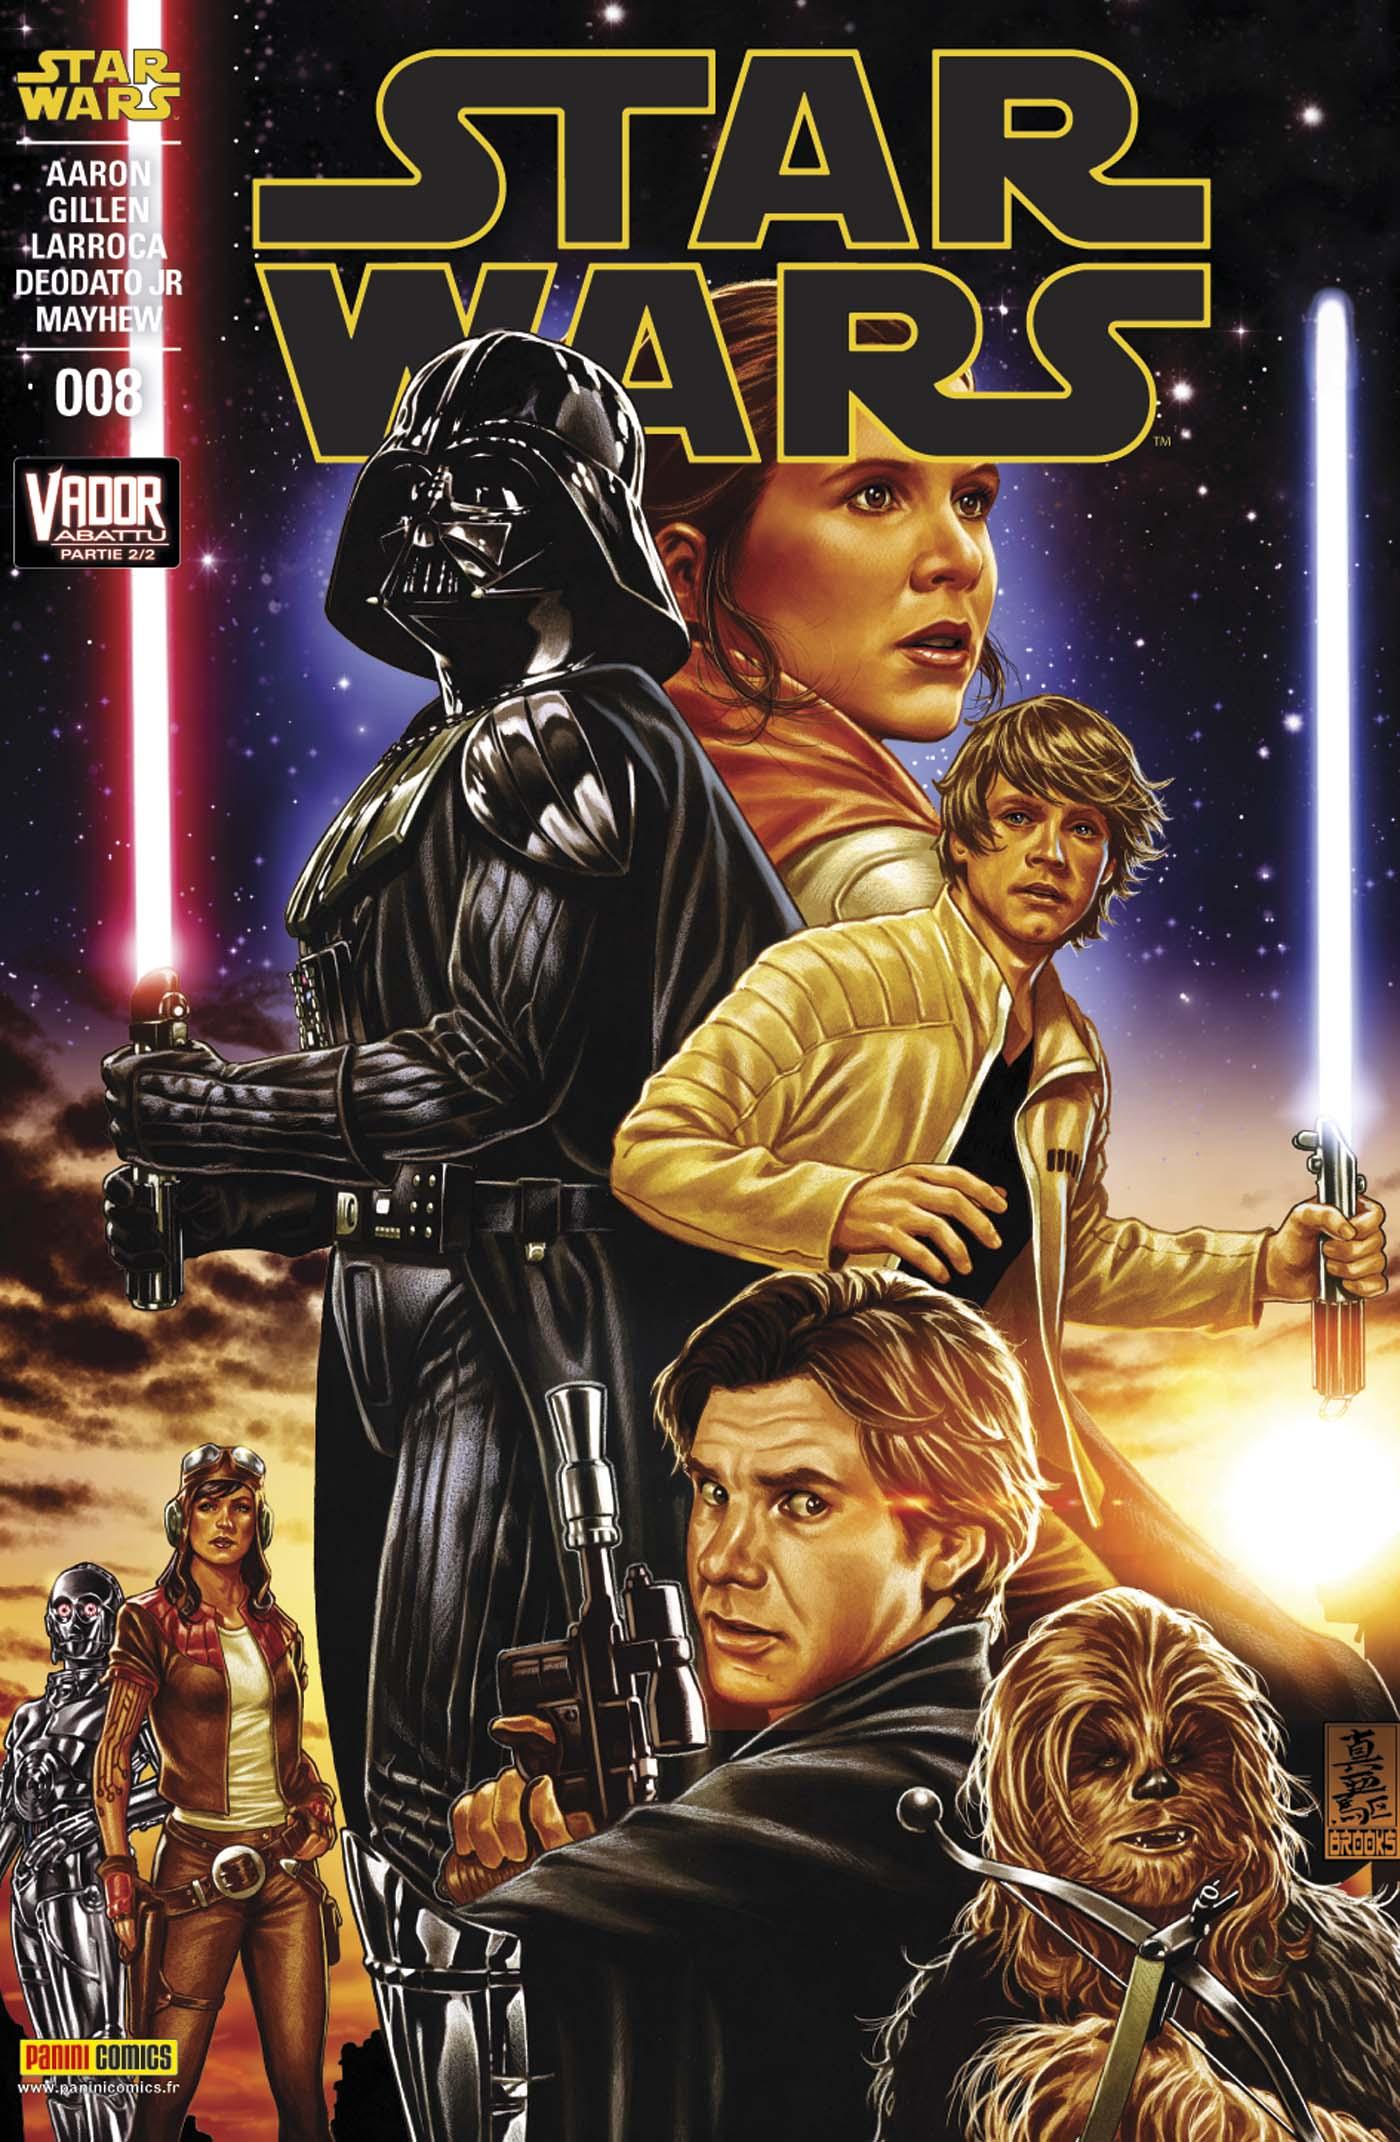 Star Wars 8 - Couverture 1/2 (Mark Brooks – tirage 50%)